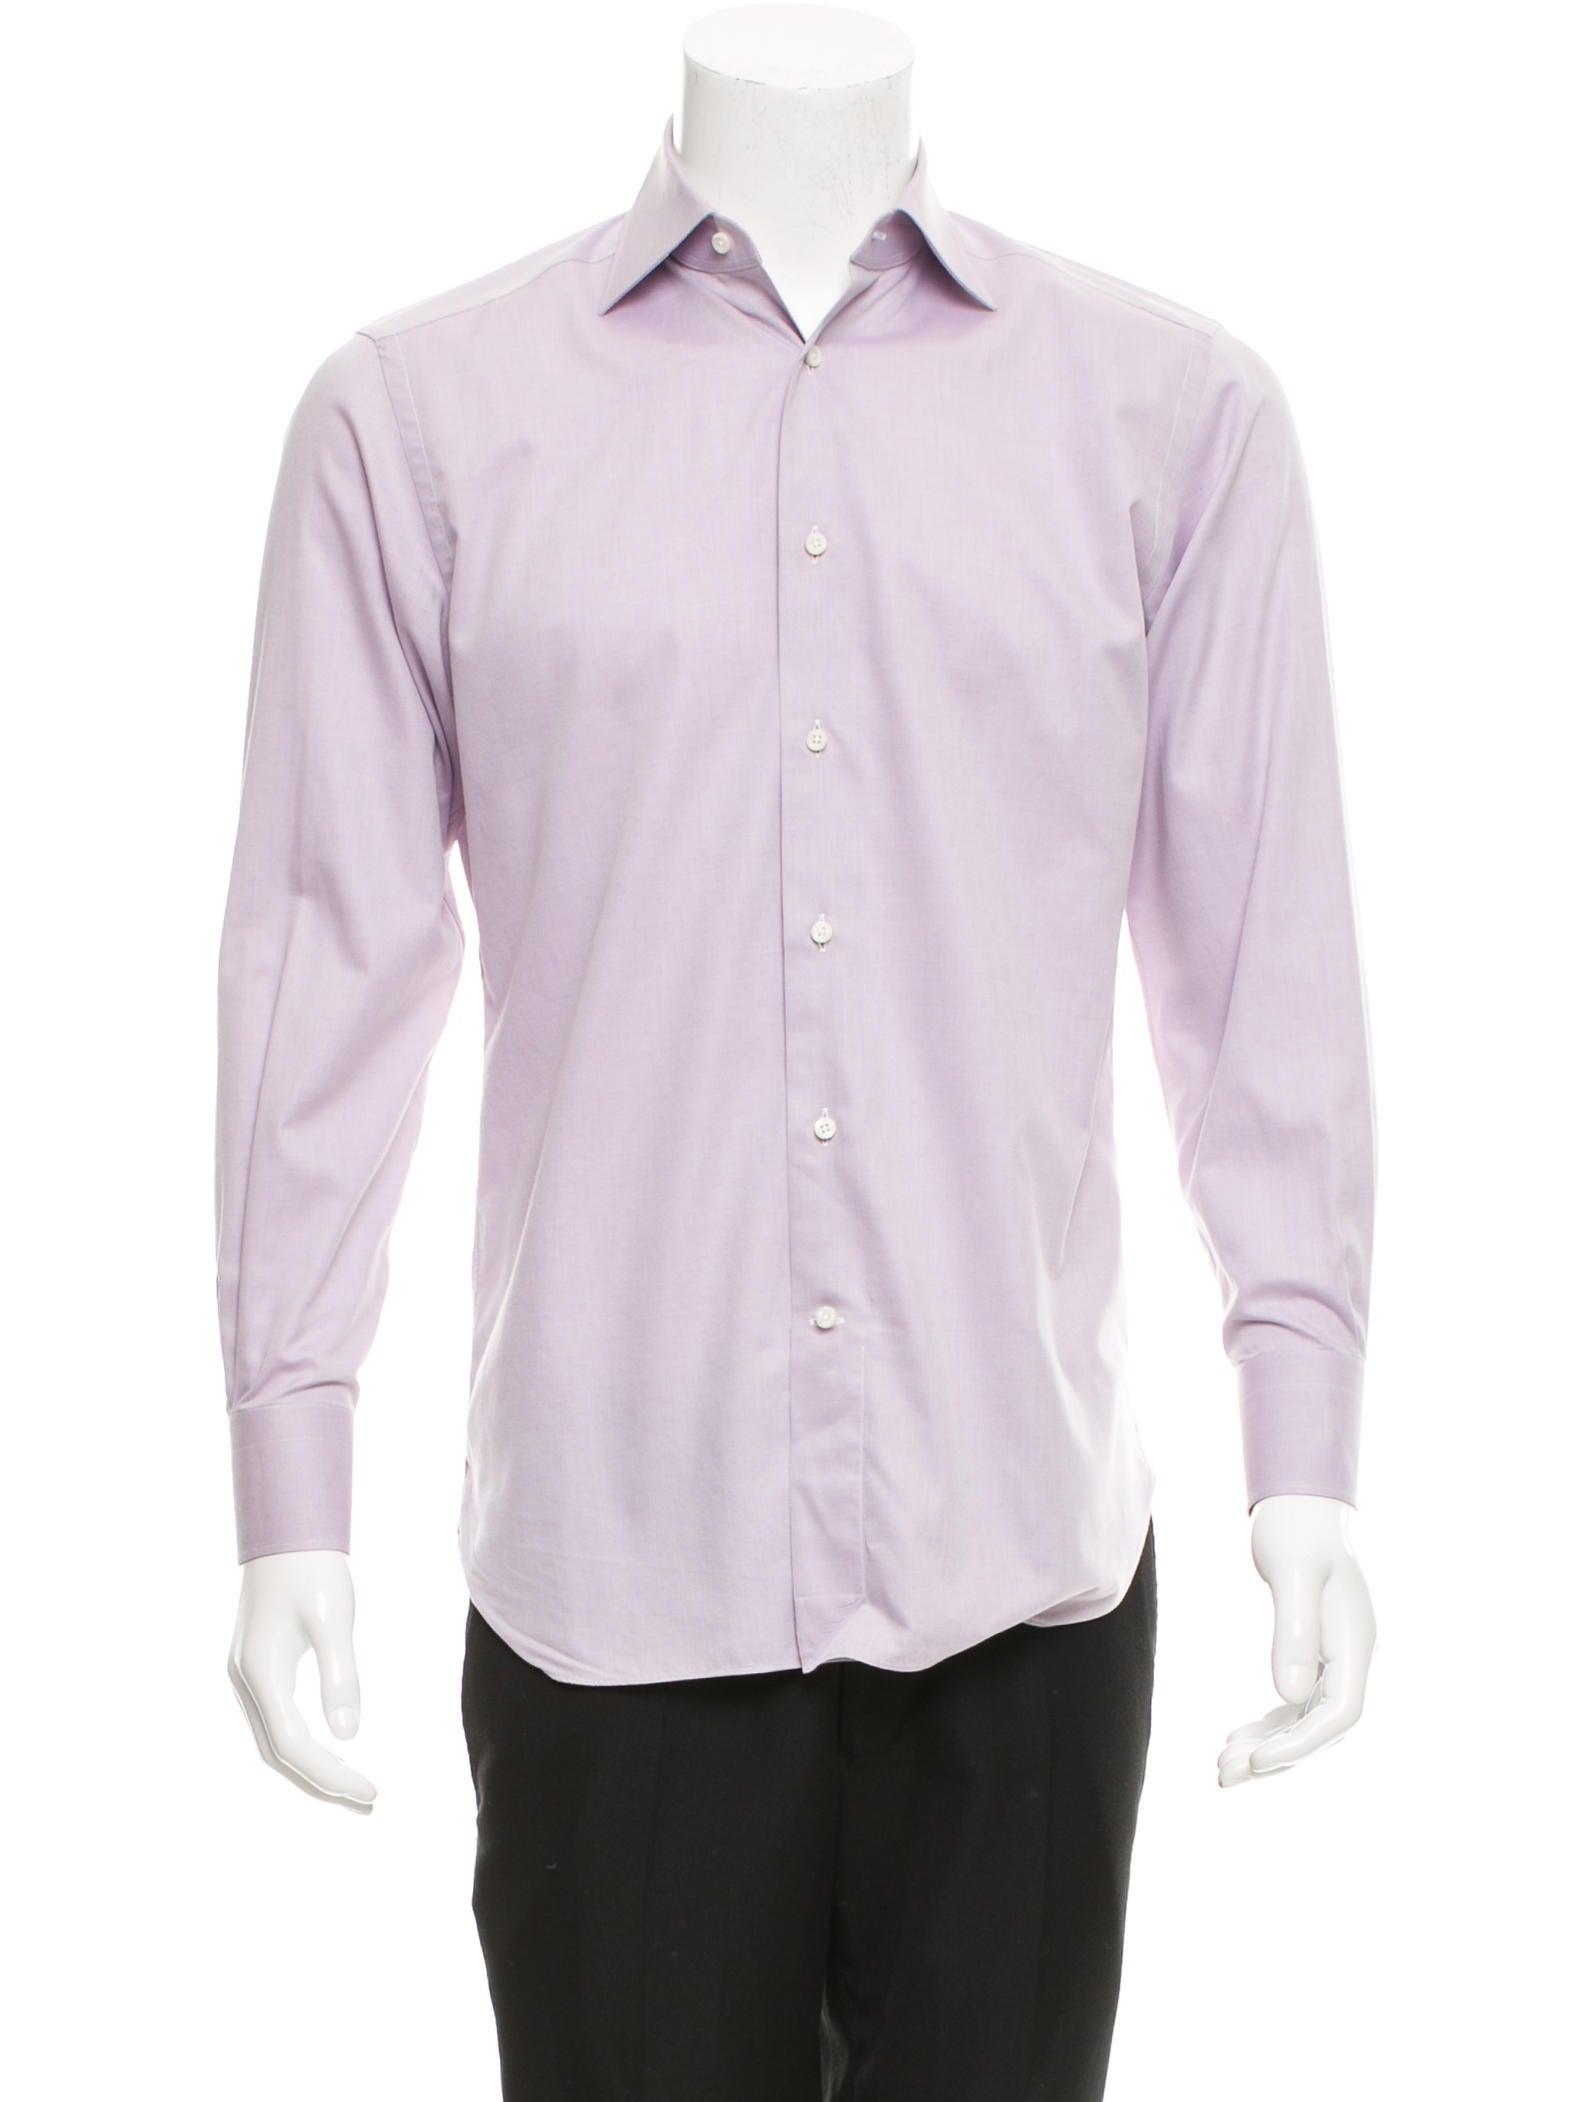 ermenegildo zegna su misura button up shirt clothing zgn23964 the realreal. Black Bedroom Furniture Sets. Home Design Ideas